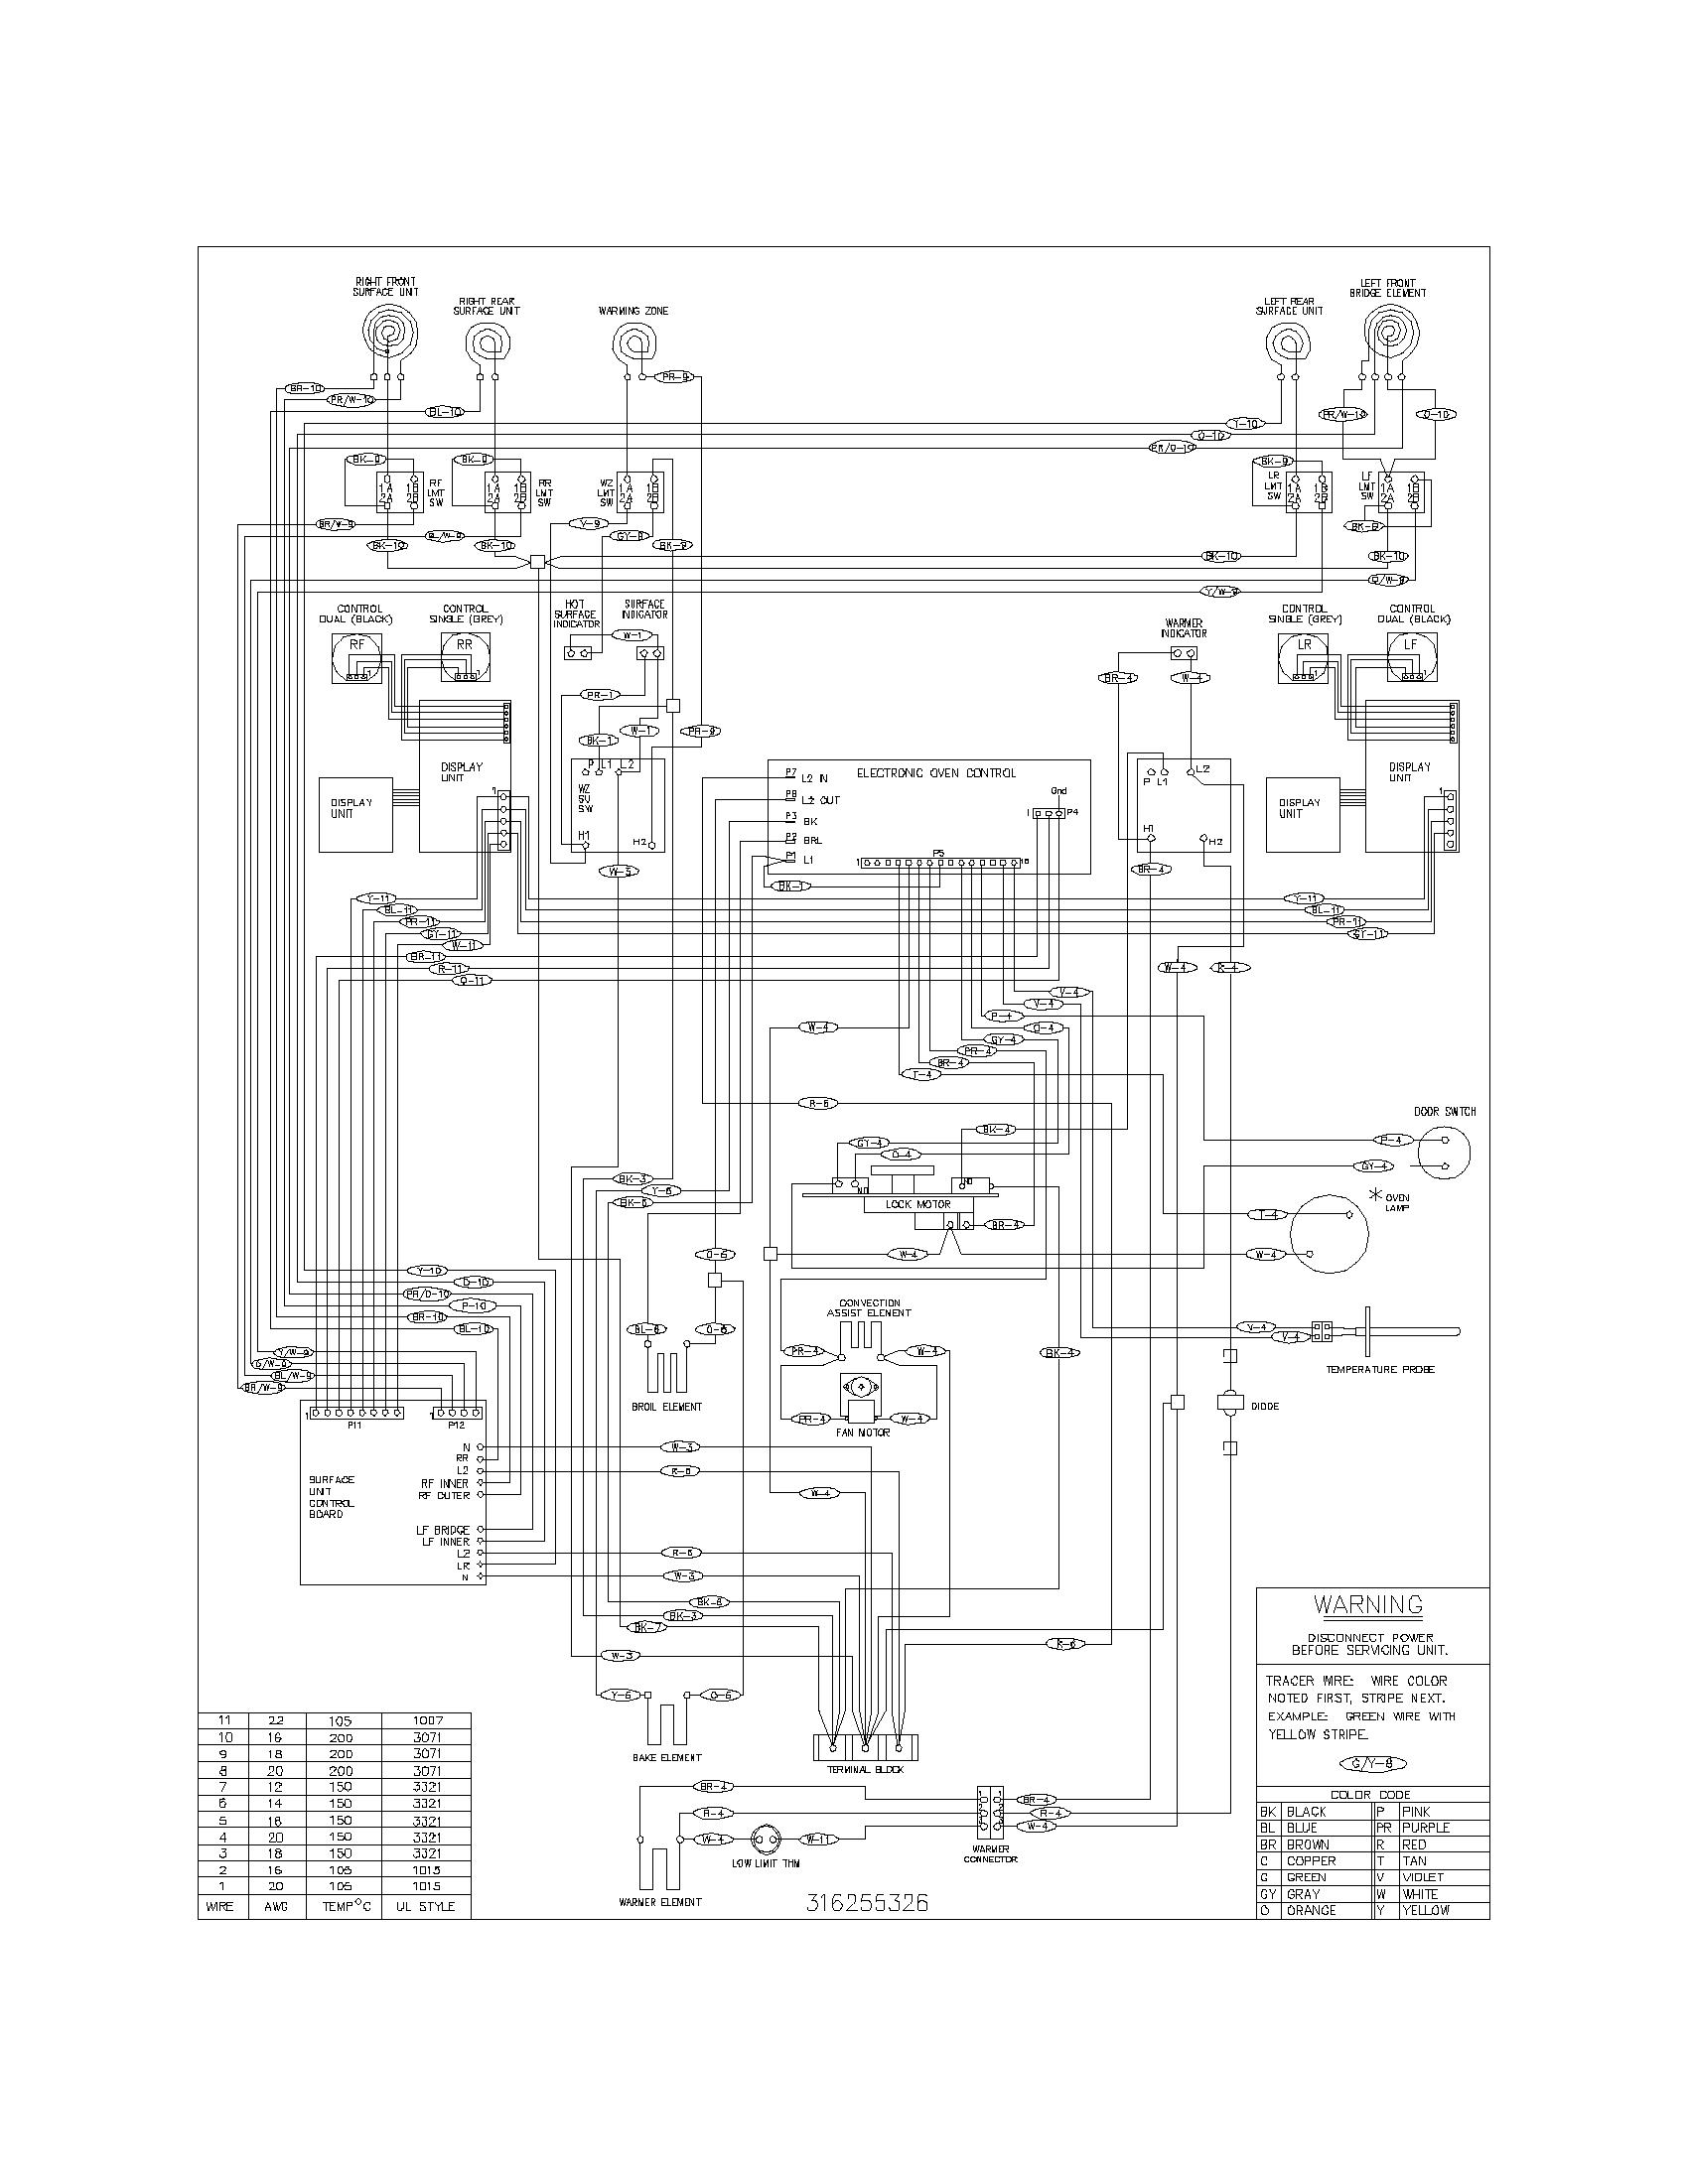 frigidaire oven wiring diagram